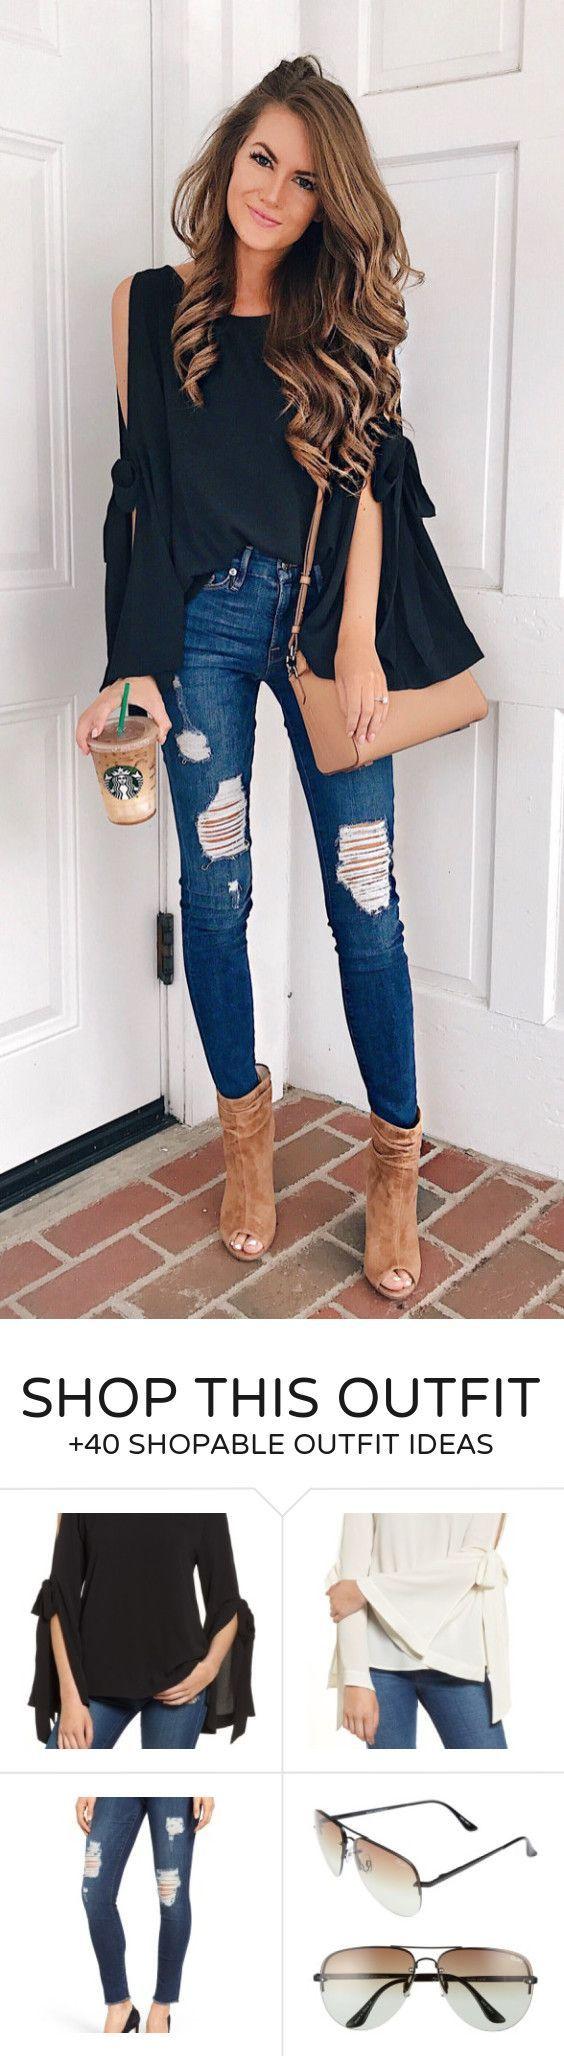 d5579b1ede74e catalogos de ropa ropa de mujer de moda moda de mujer ropa de moda para  mujer 2018 ropa casual pacas de ropa moda 2018 mujer paginas para comprar  ropa ...